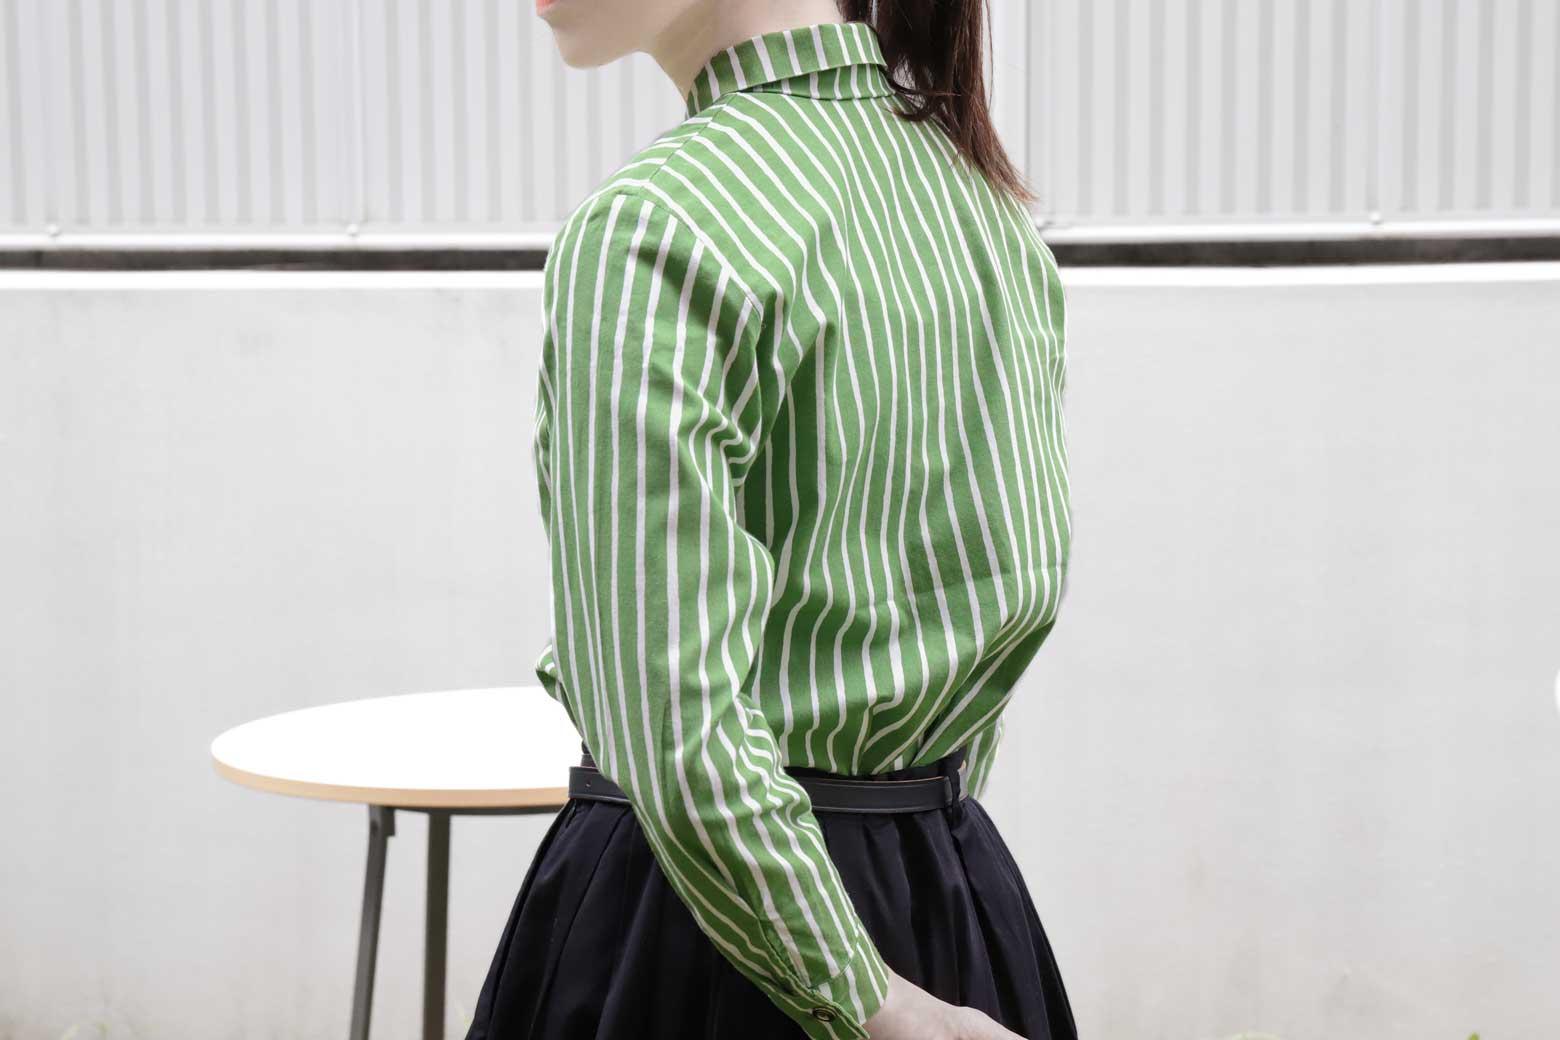 marimekko Piccolo JOKAPOIKA green white 140size/マリメッコ ピッコロ ヨカポイカ グリーン ホワイト 140サイズ